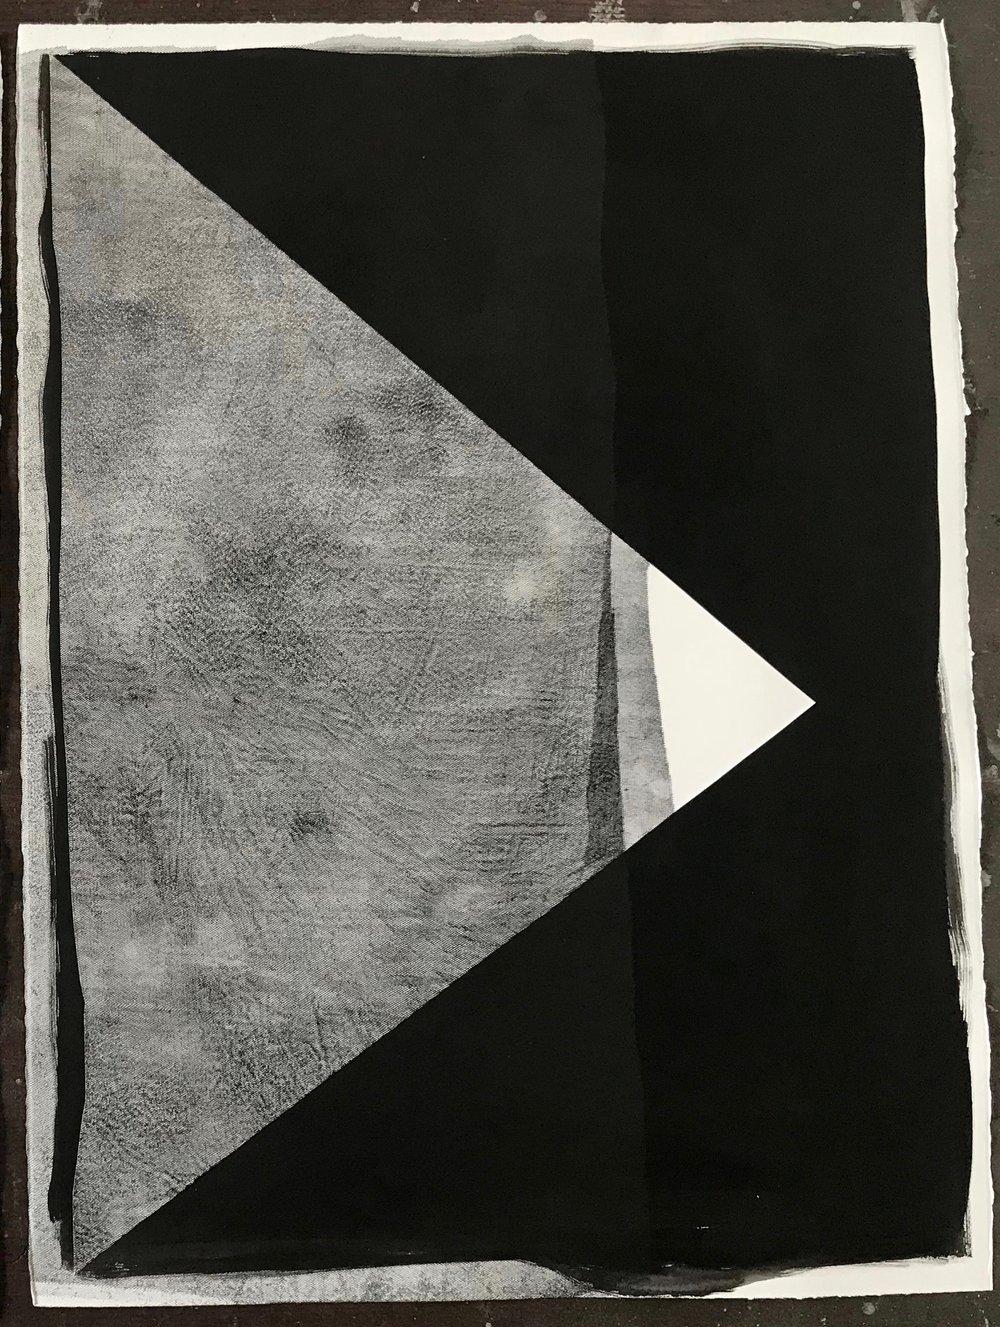 Spring Loaded Fragments #6